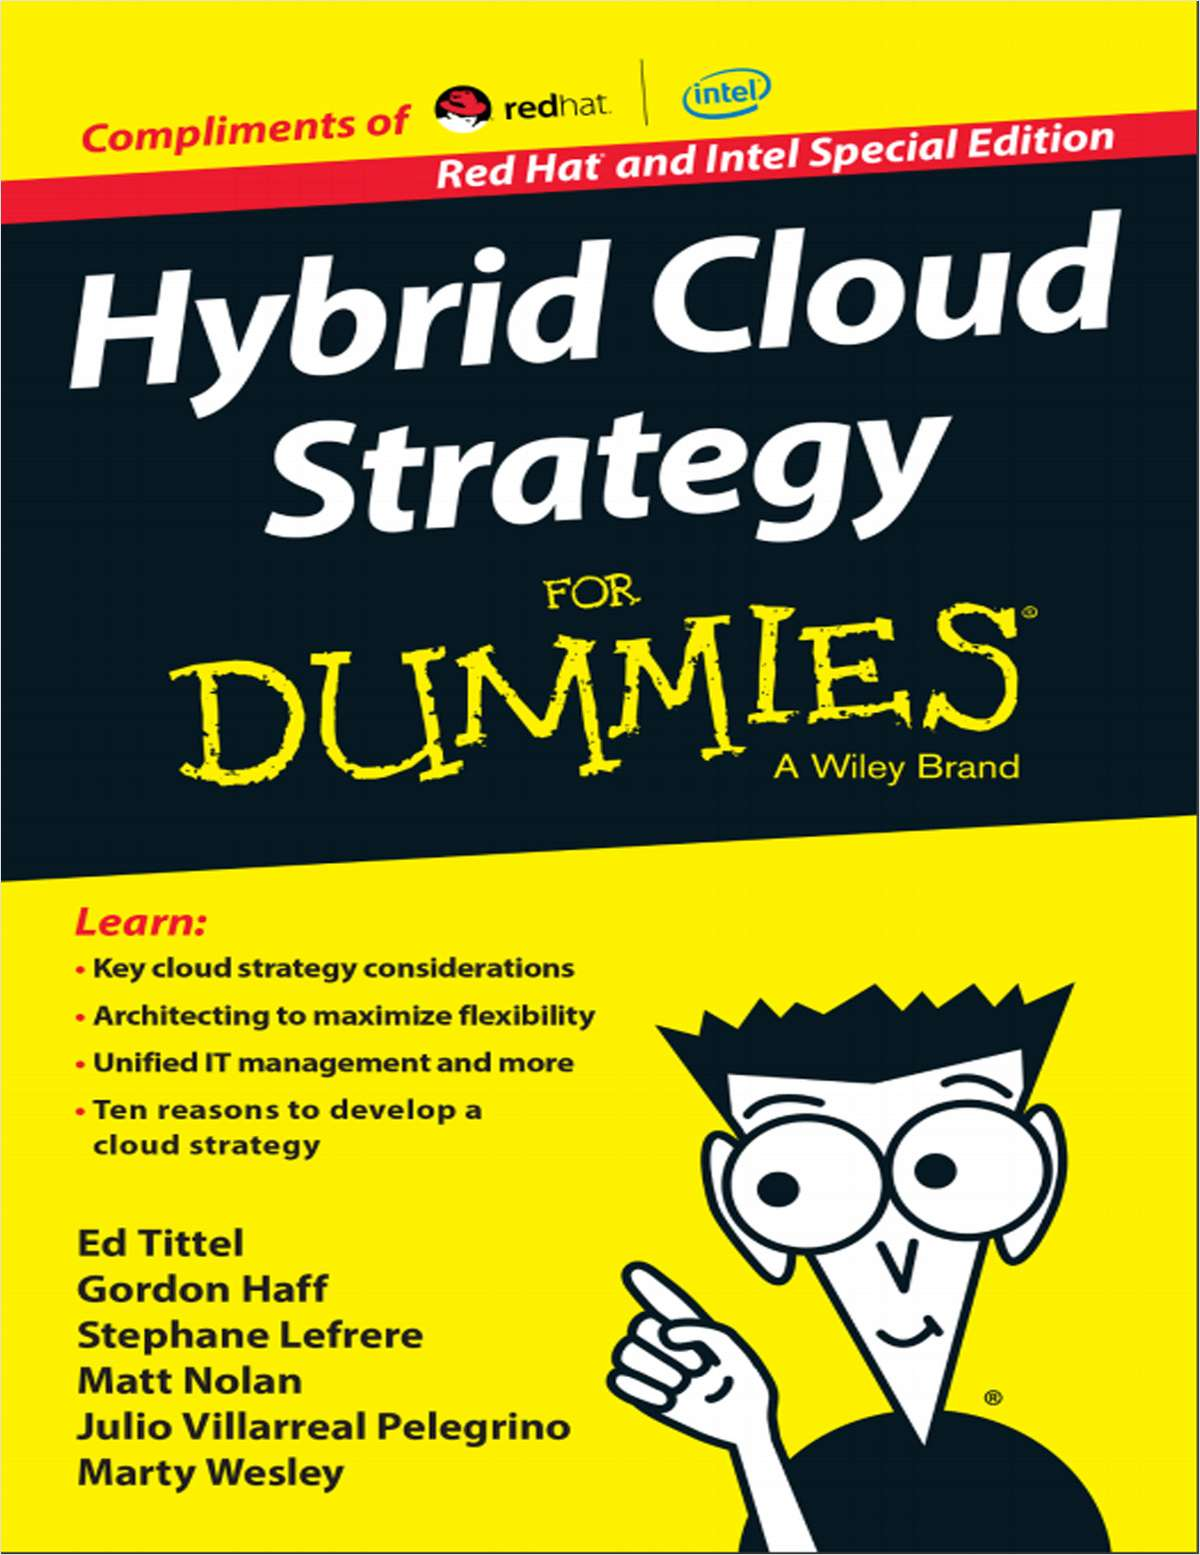 Hybrid Cloud Strategy for Dummies